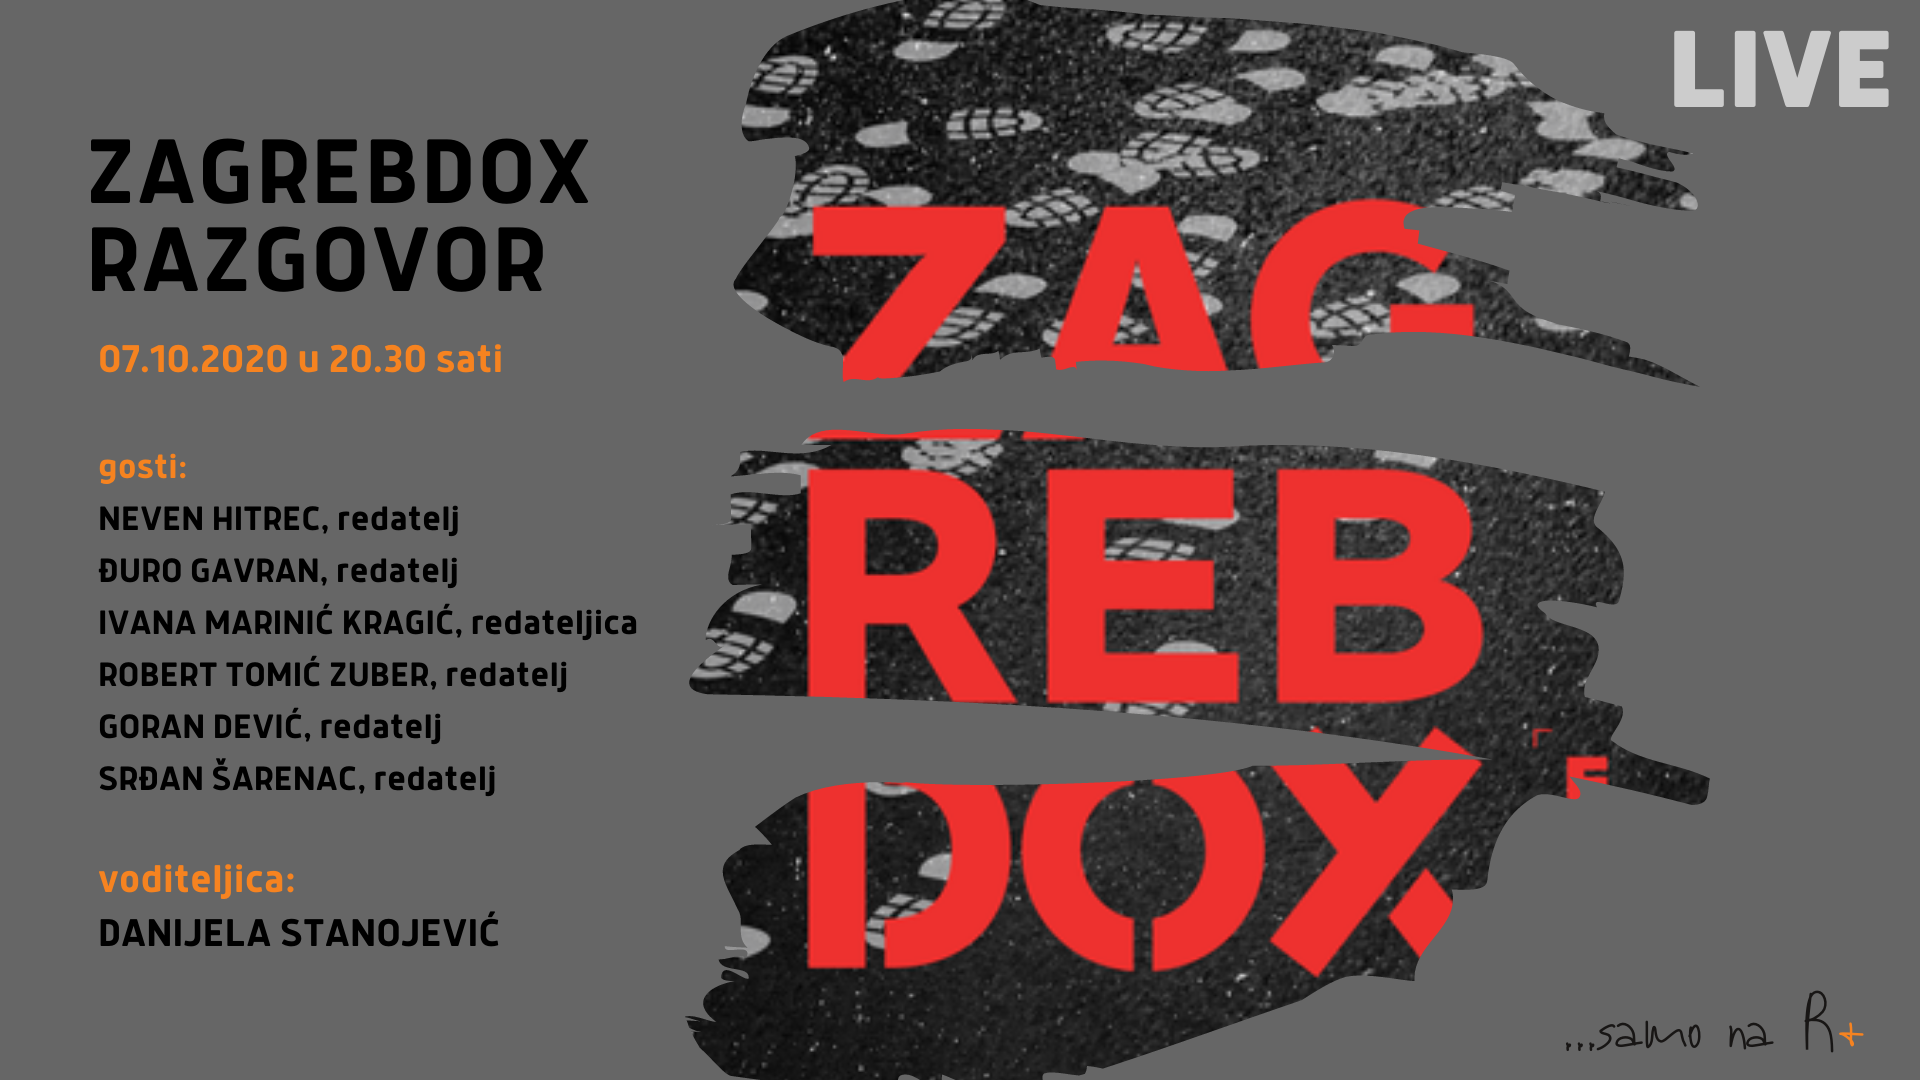 R+: ZagrebDox Special Edition razgovor - hrvatski autori